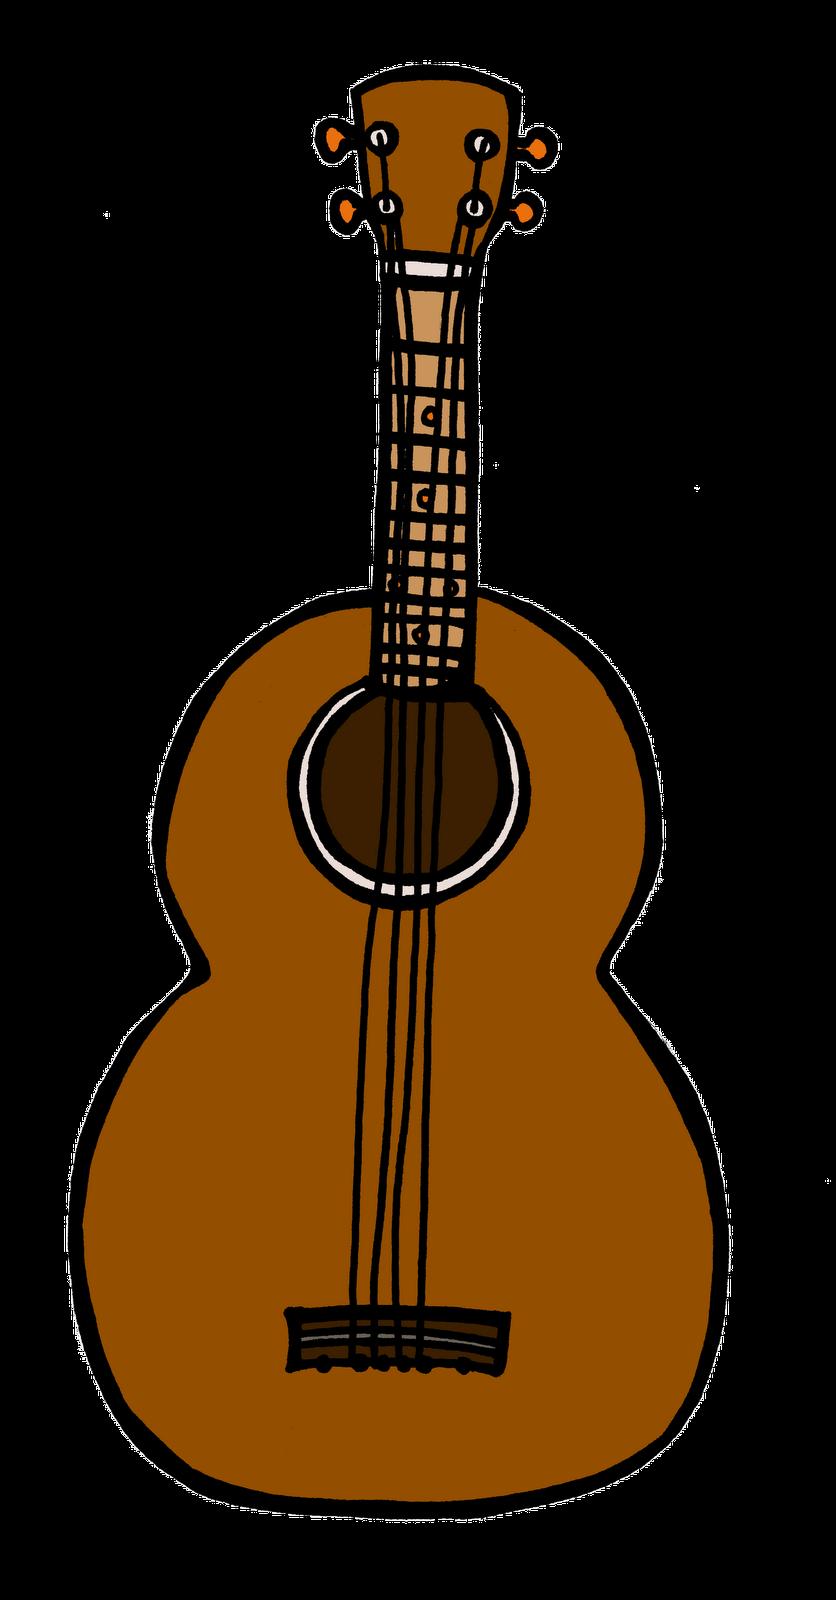 Clipart guitar ukelele. The art of teaching